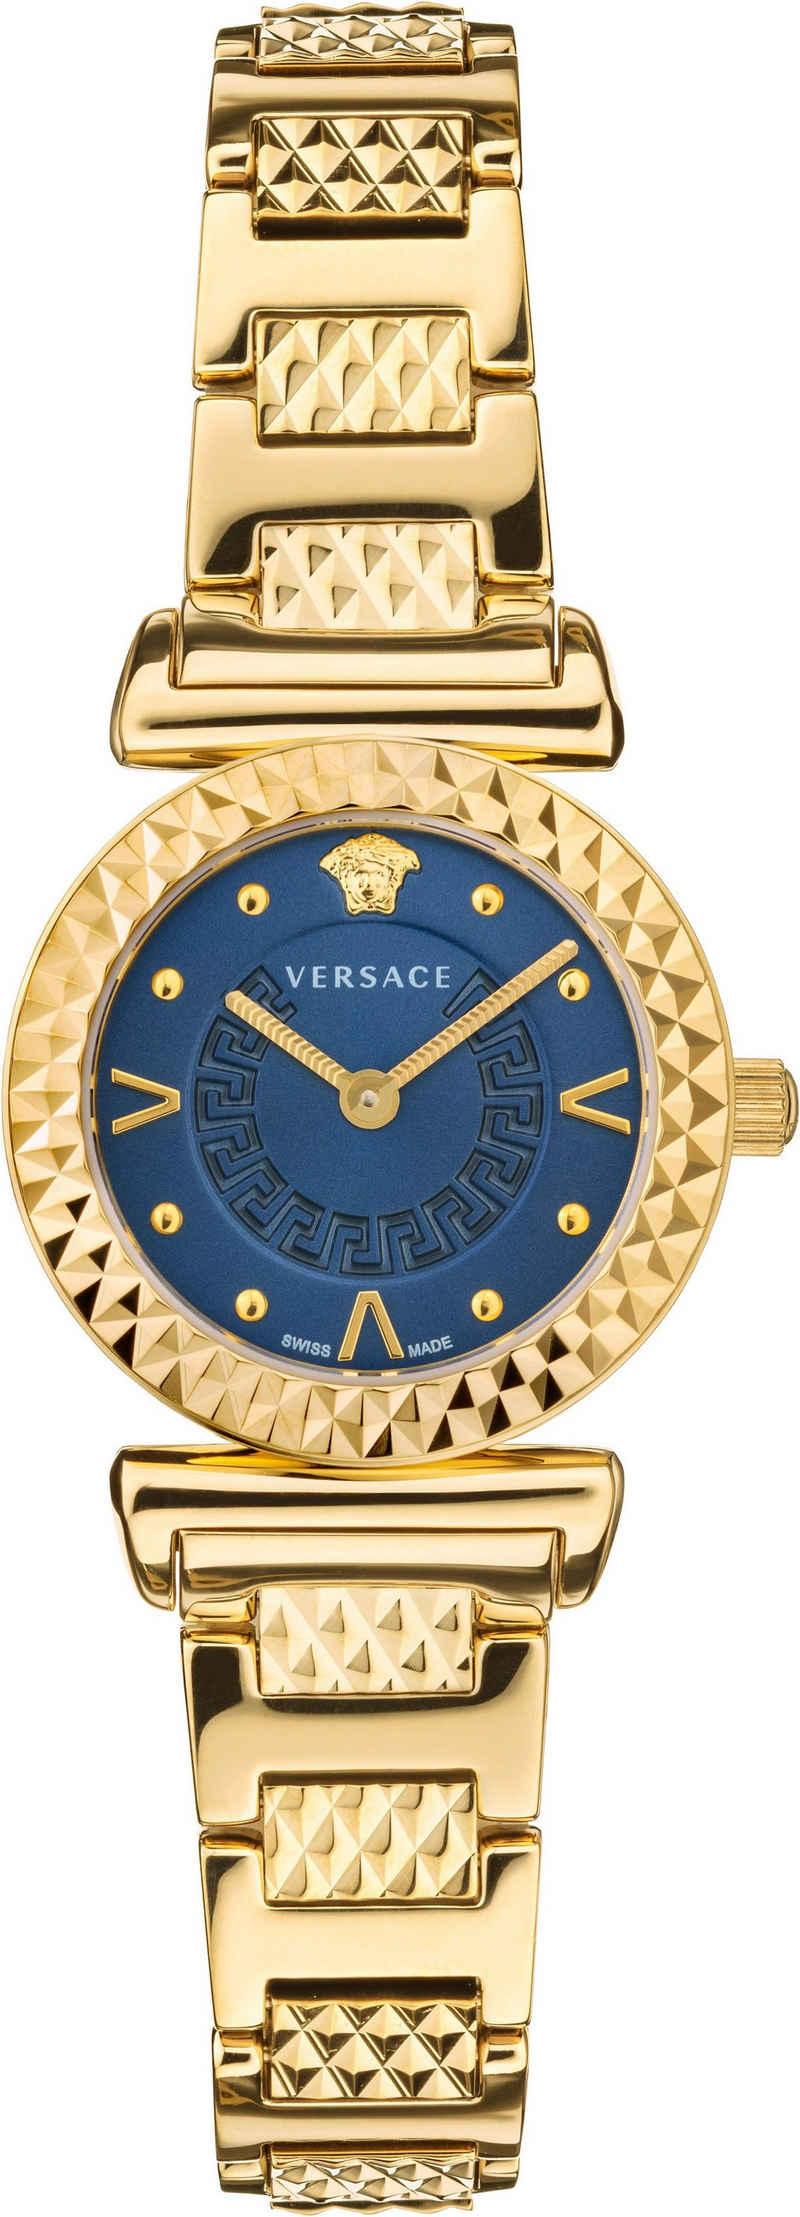 Versace Schweizer Uhr »MINI VANITY, VEAA01420«